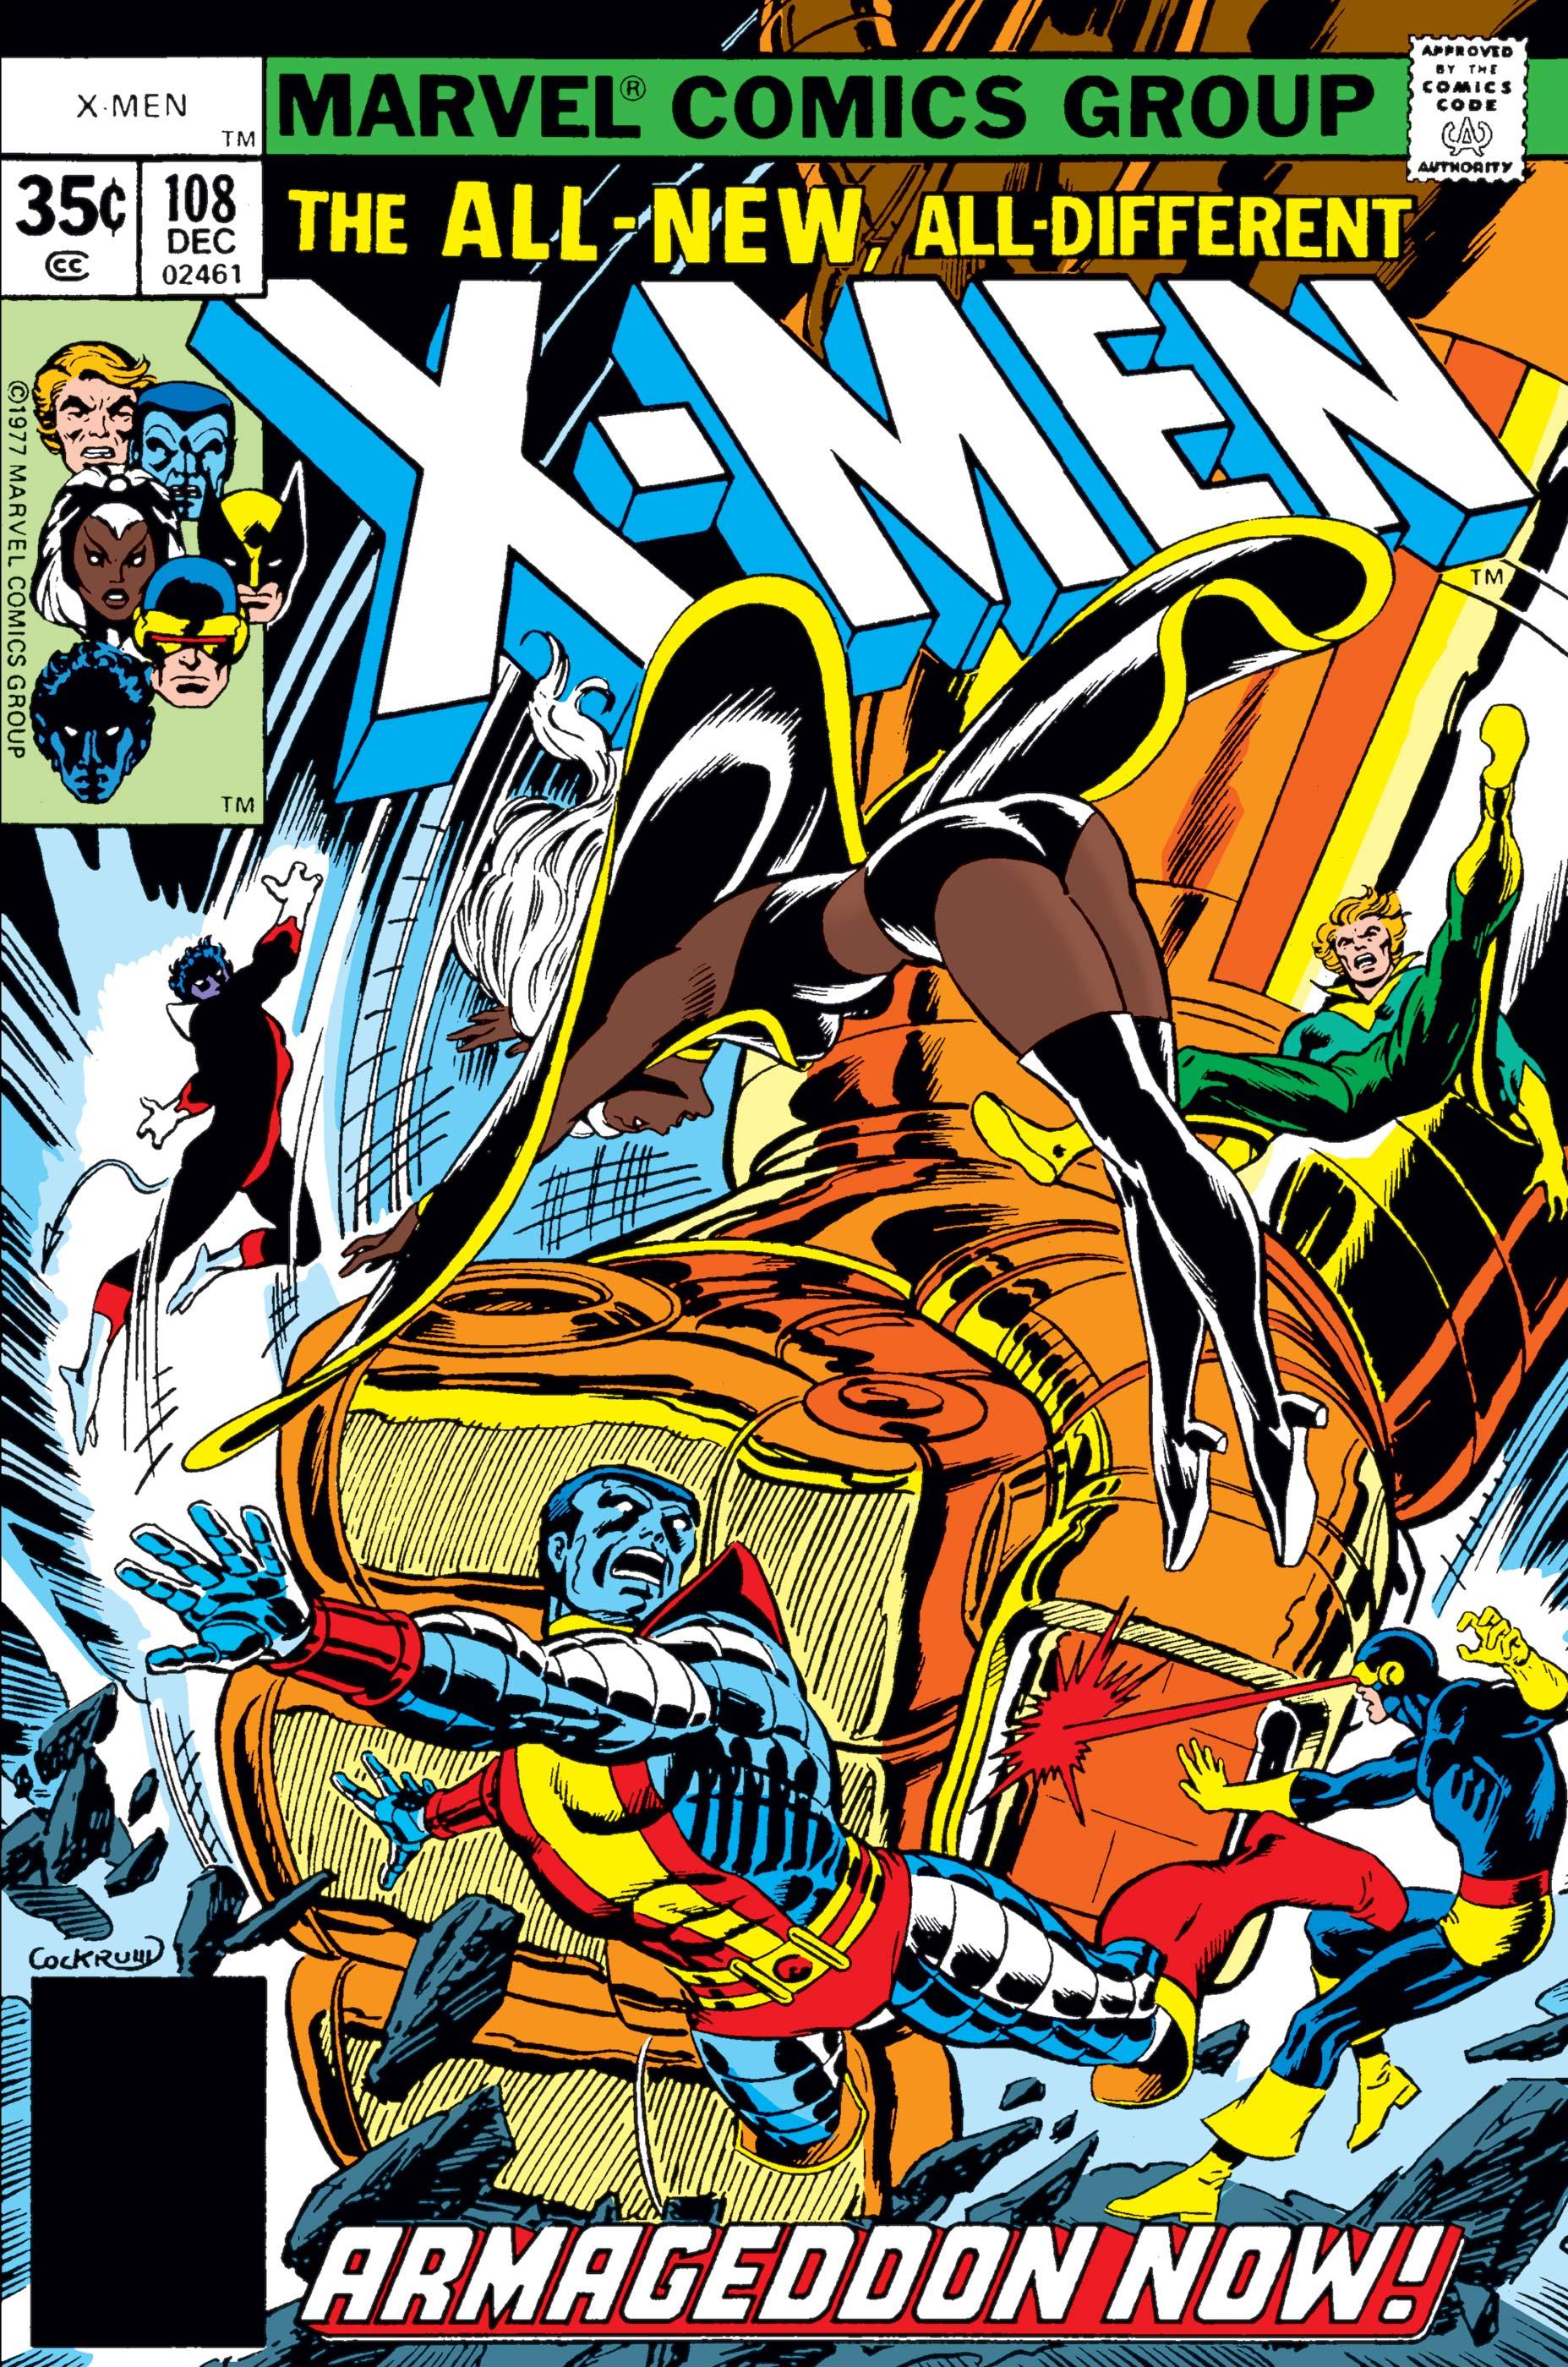 Uncanny X-Men (1963) #108